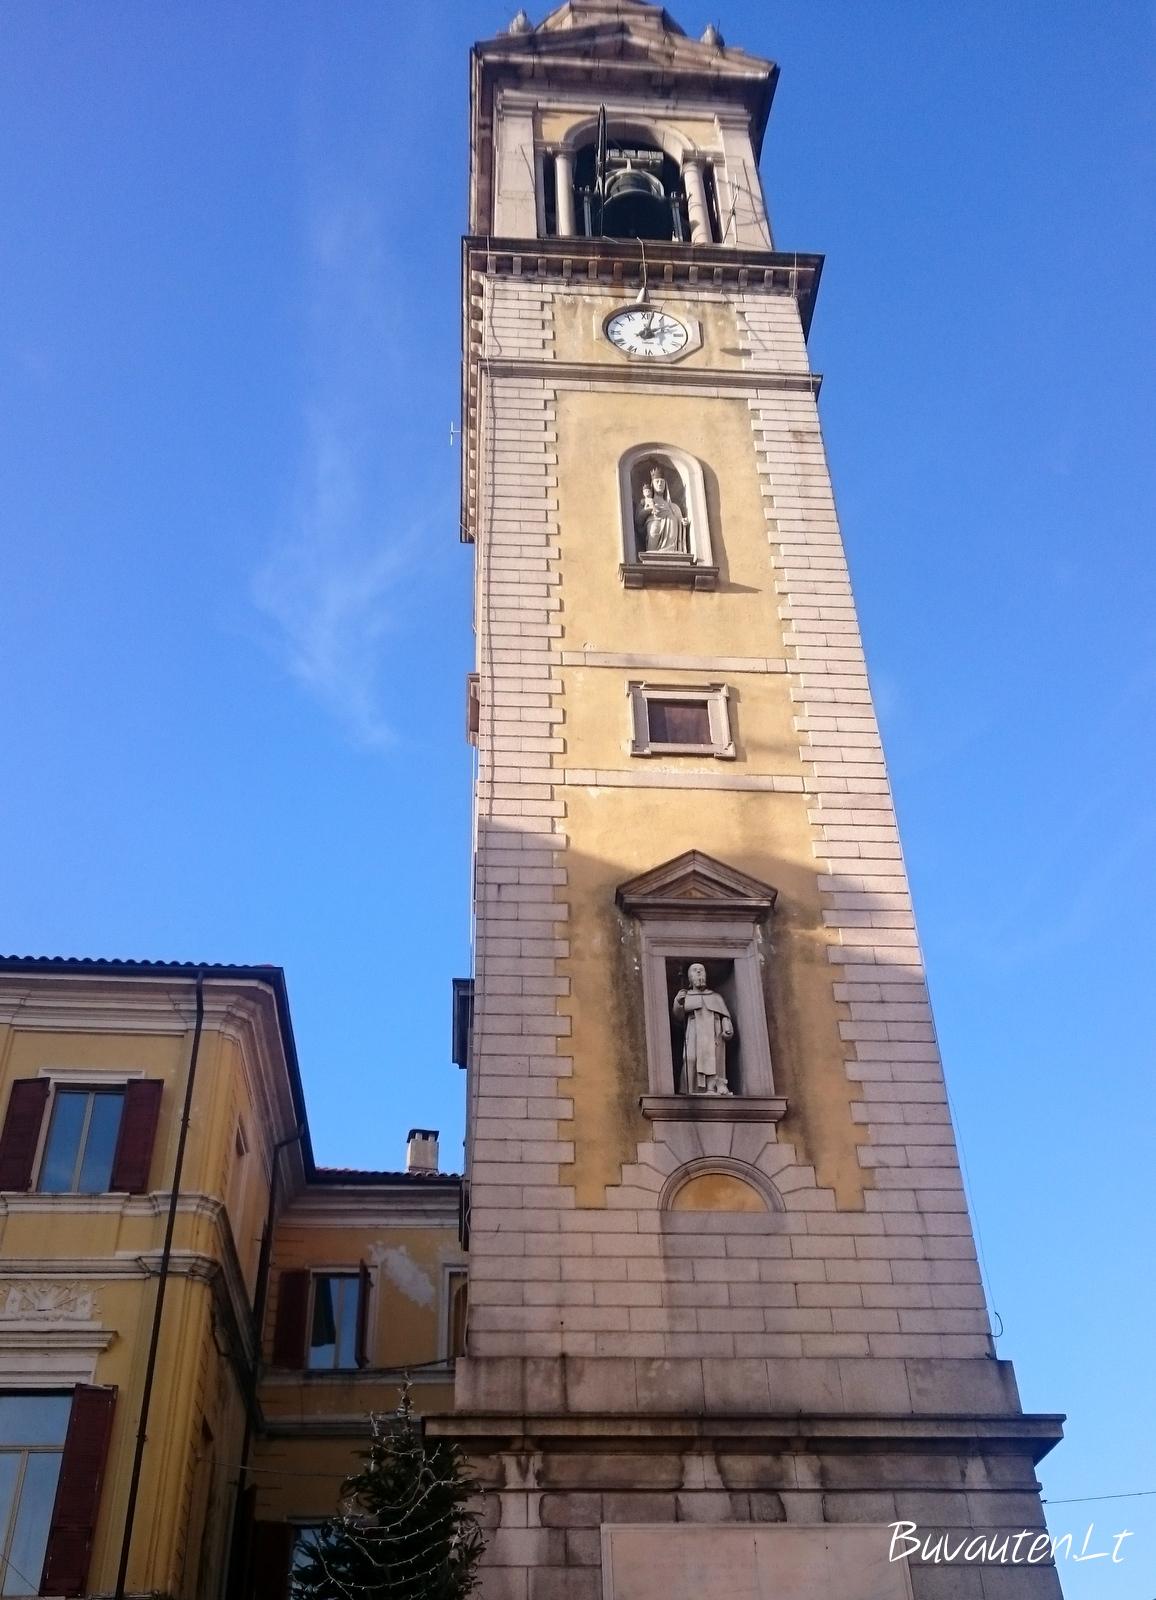 Castelleto sopra Ticino – čia ilgai neužtrukom